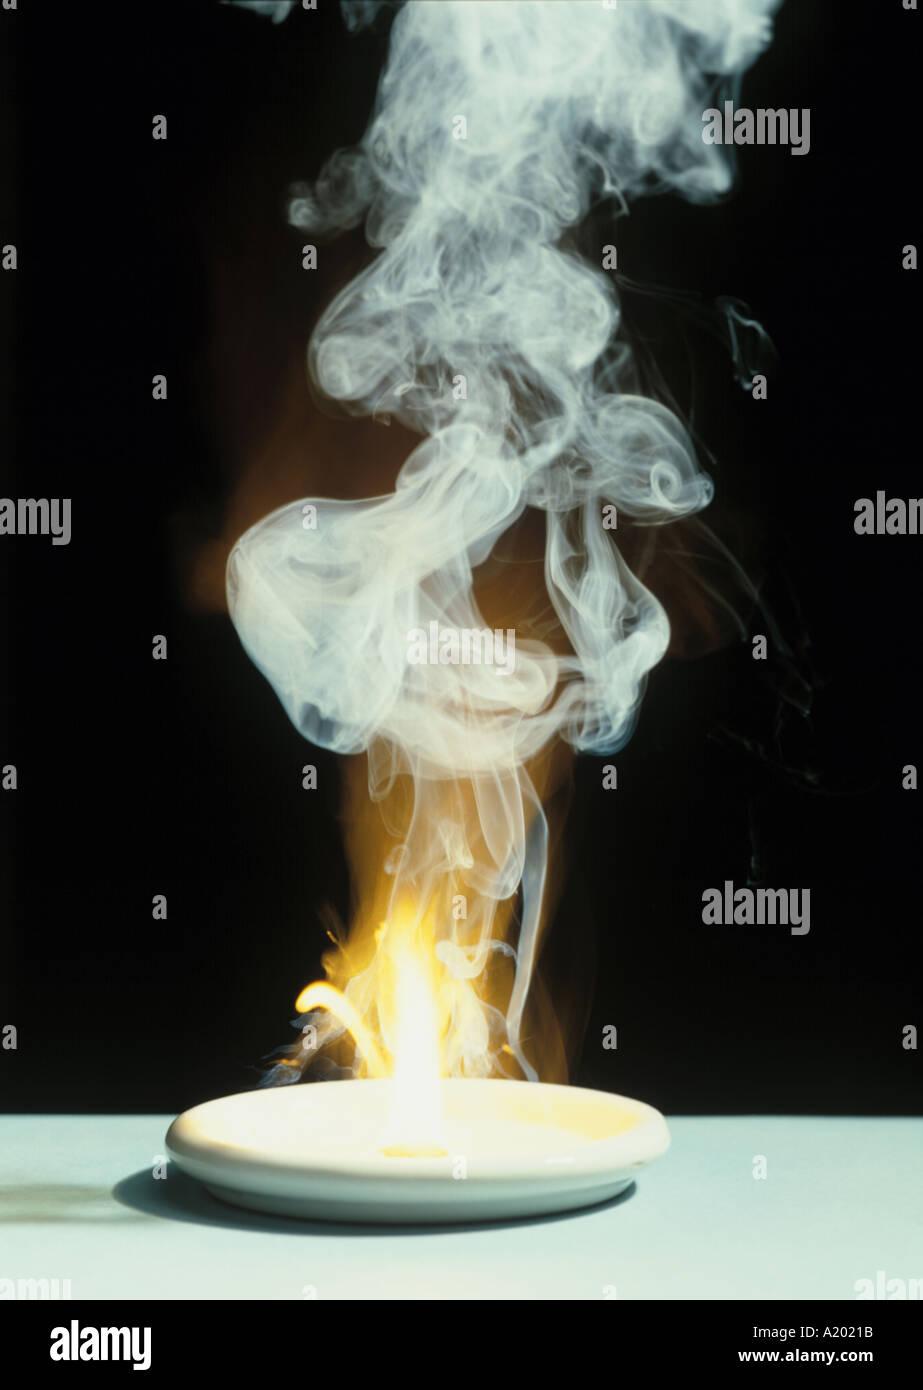 phosphorus burning in air - Stock Image